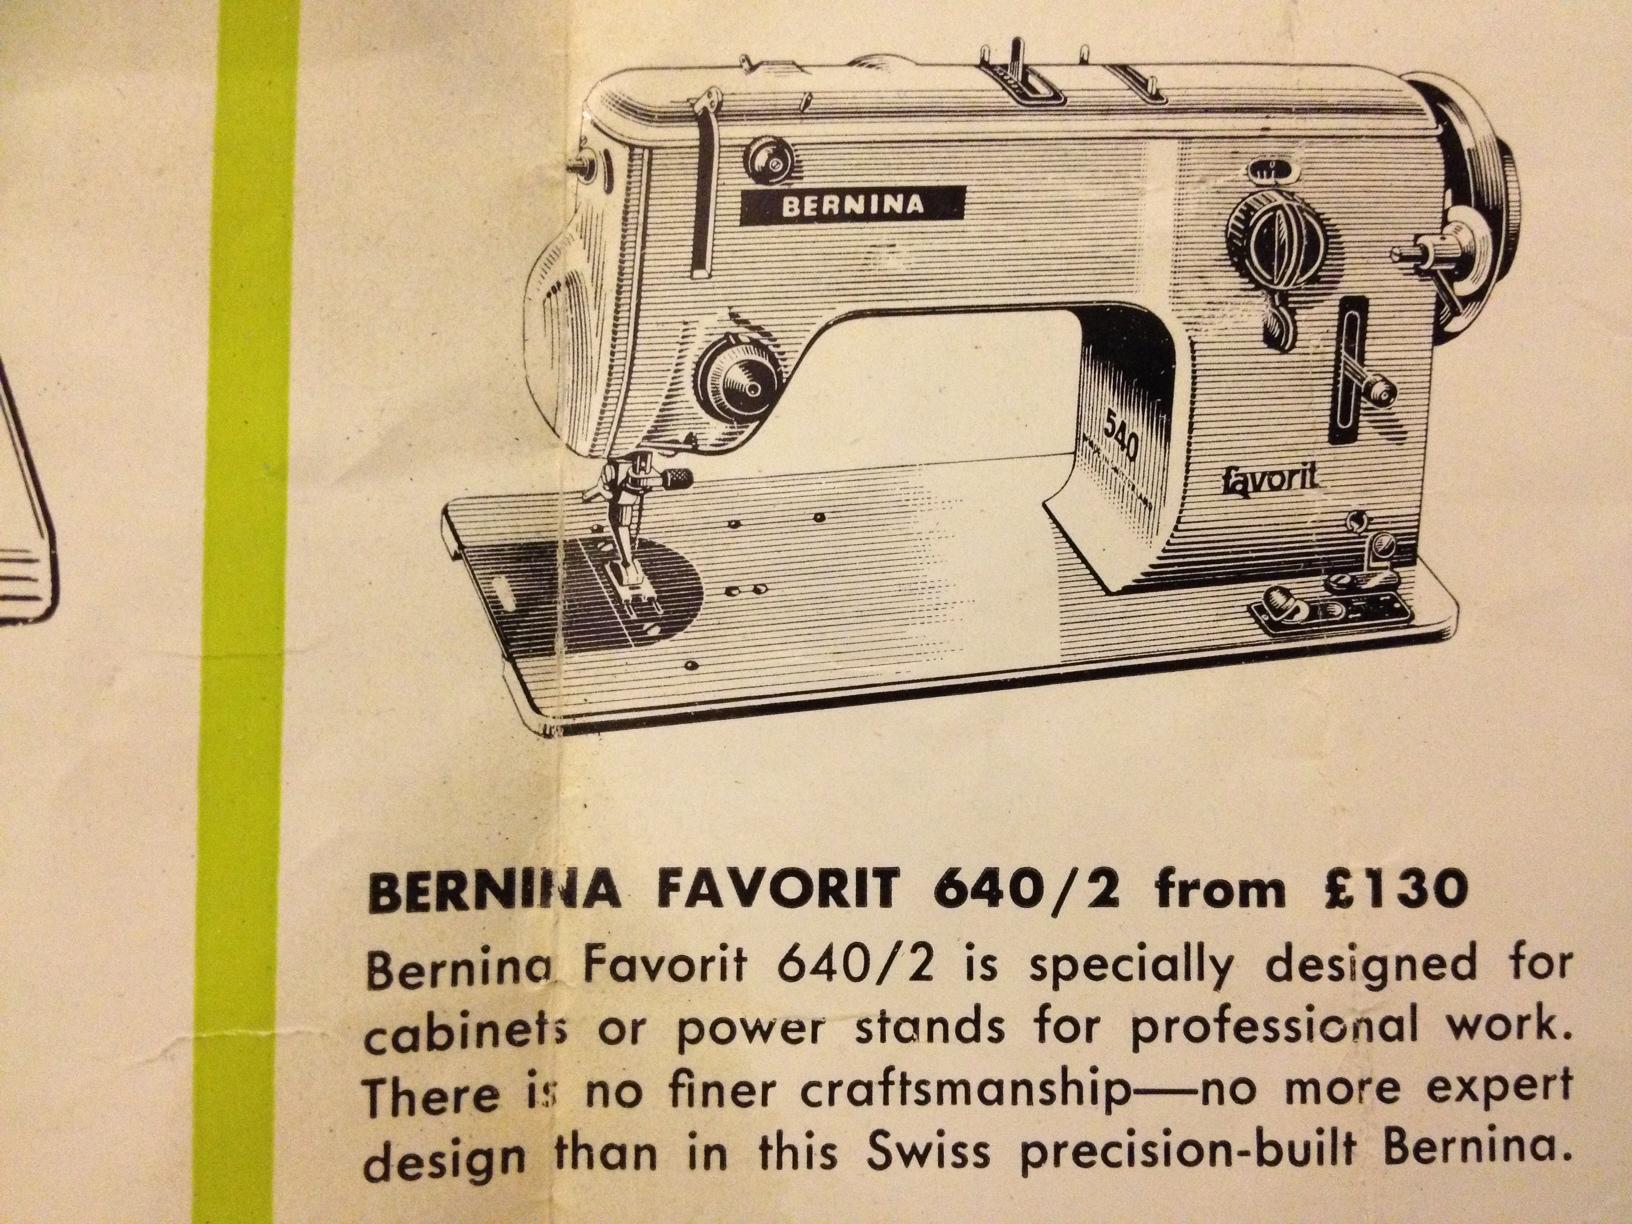 Bernina 640-2 brochure pricing